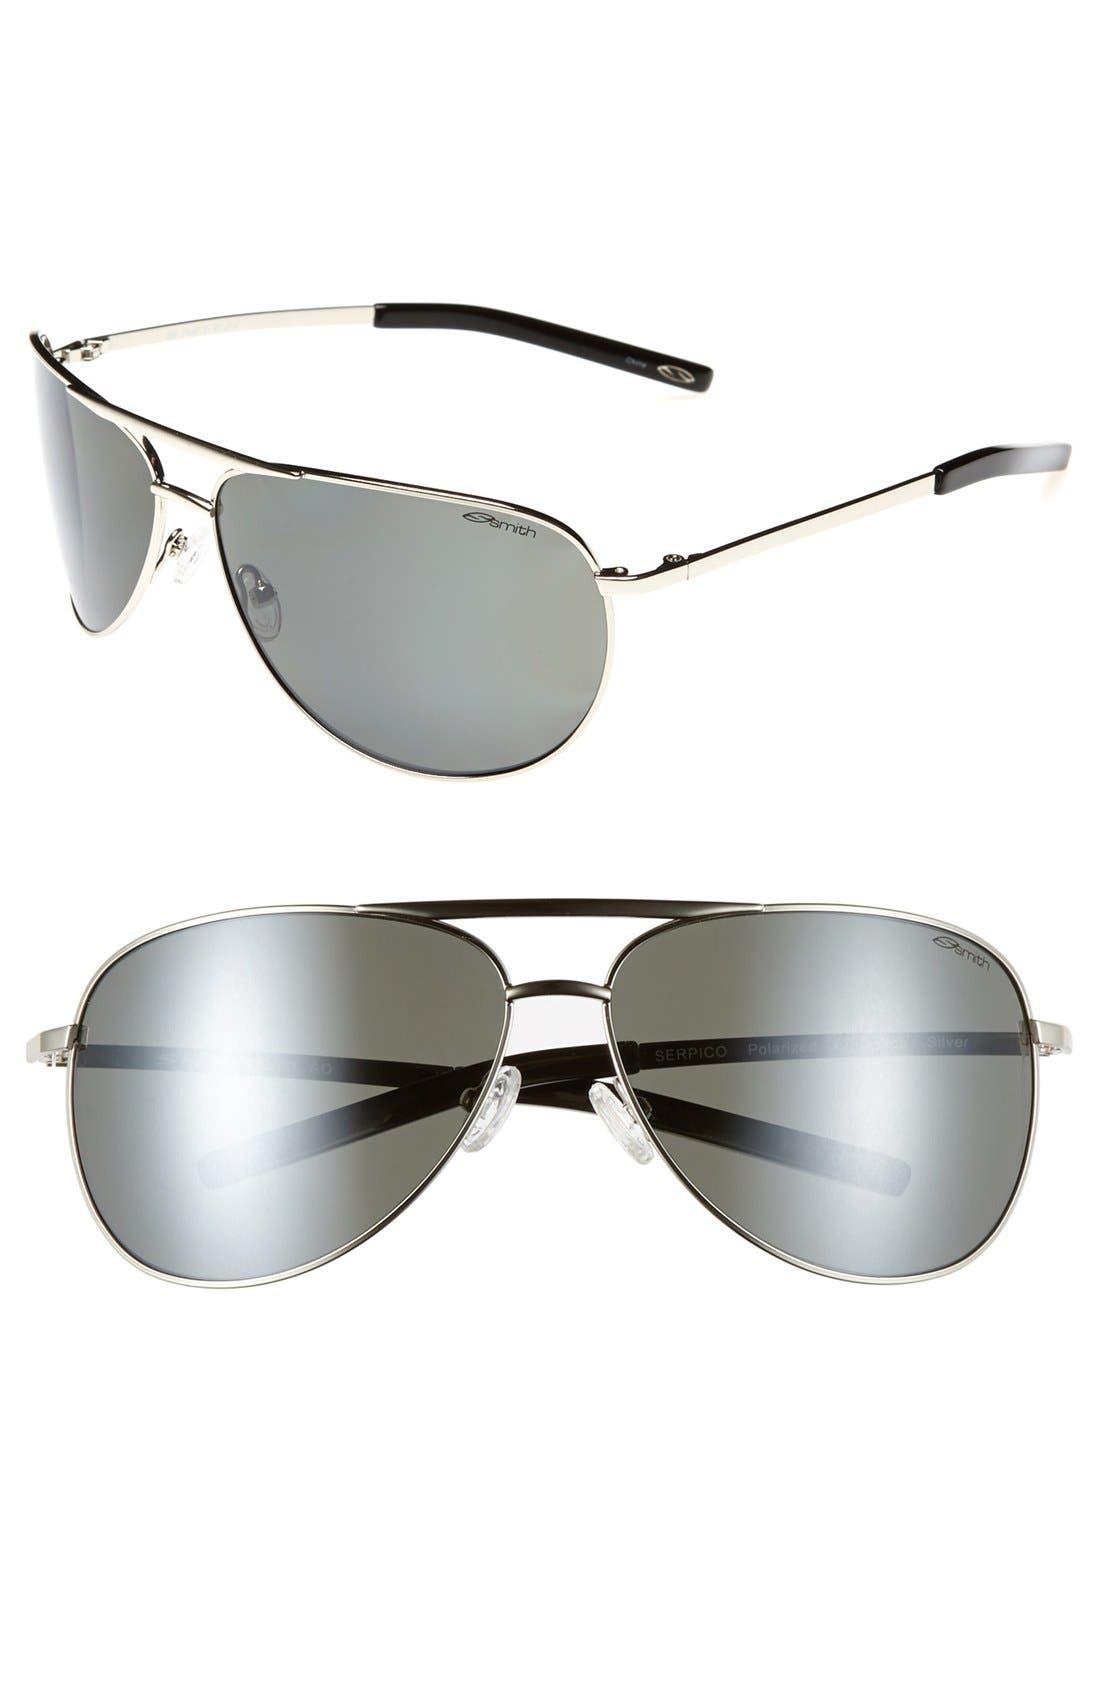 Serpico 65mm Polarized Aviator Sunglasses,                         Main,                         color, SILVER